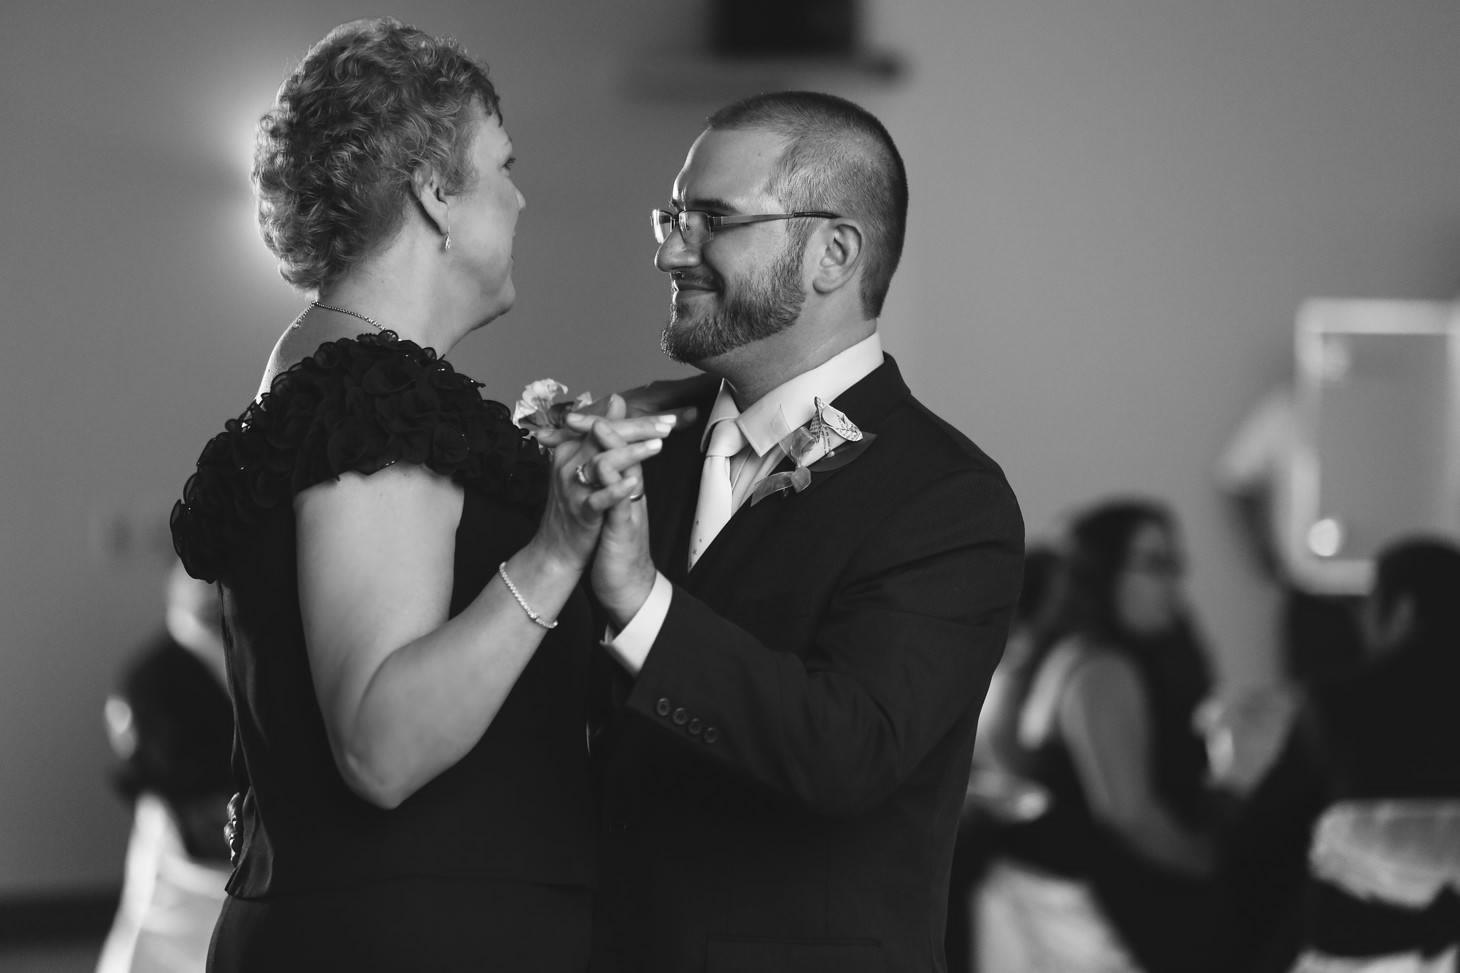 031-nyc-wedding-photographer-nj-nerdy-dr-who-firehouse-wedding-smitten-chickens.jpg